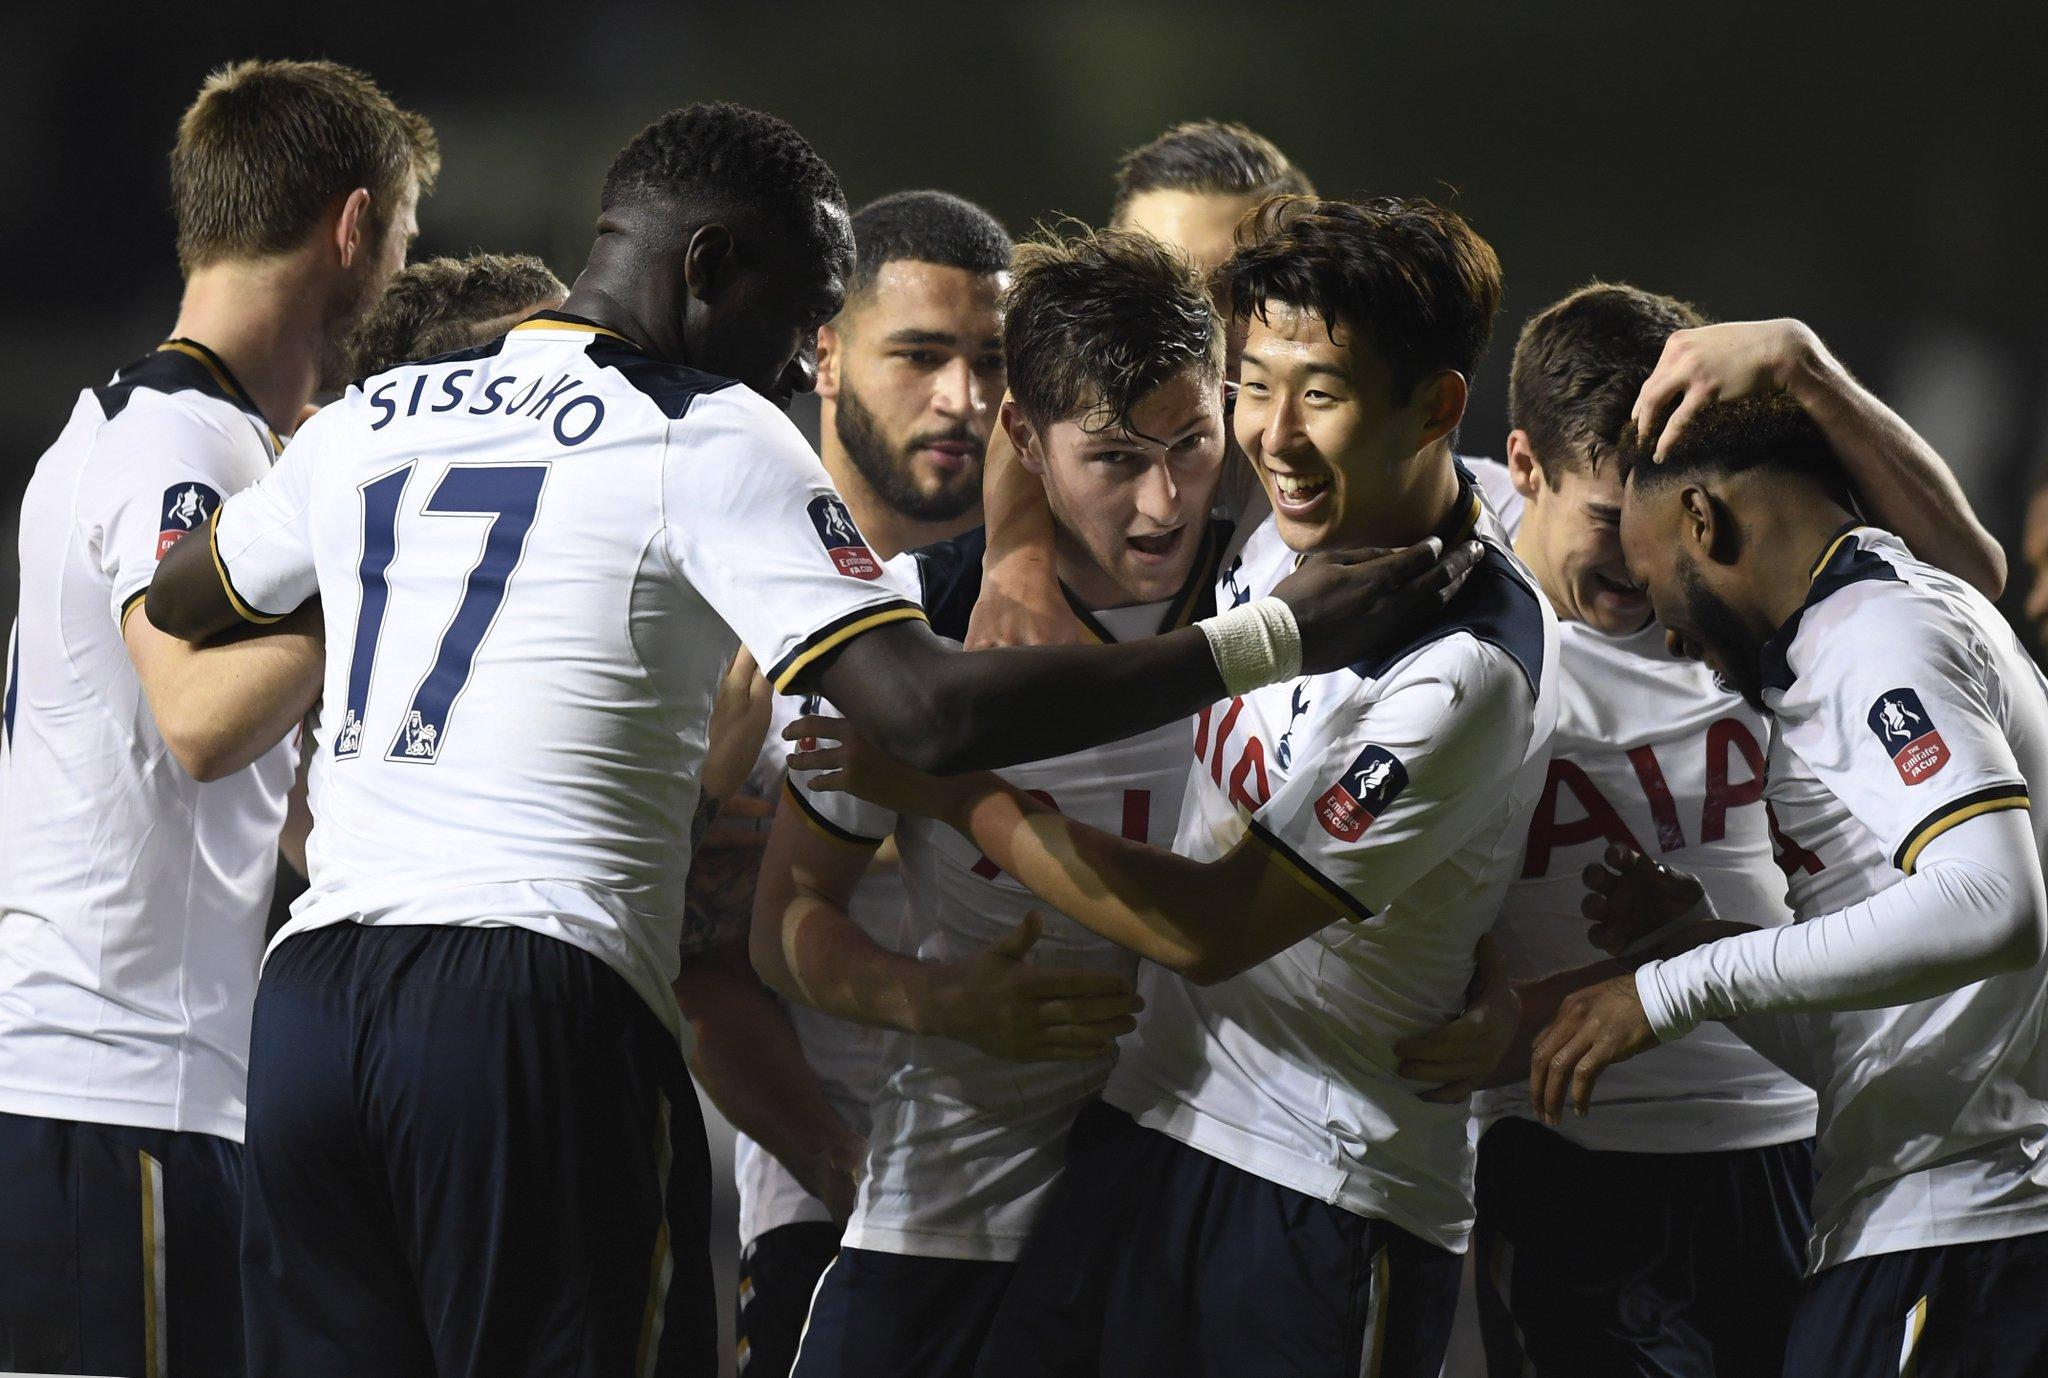 Tottenham at home in domestic competition this season:  WDWWWDWWWWWW  Mauricio Pochettino's side in fantastic form. https://t.co/yT49K6SrLl